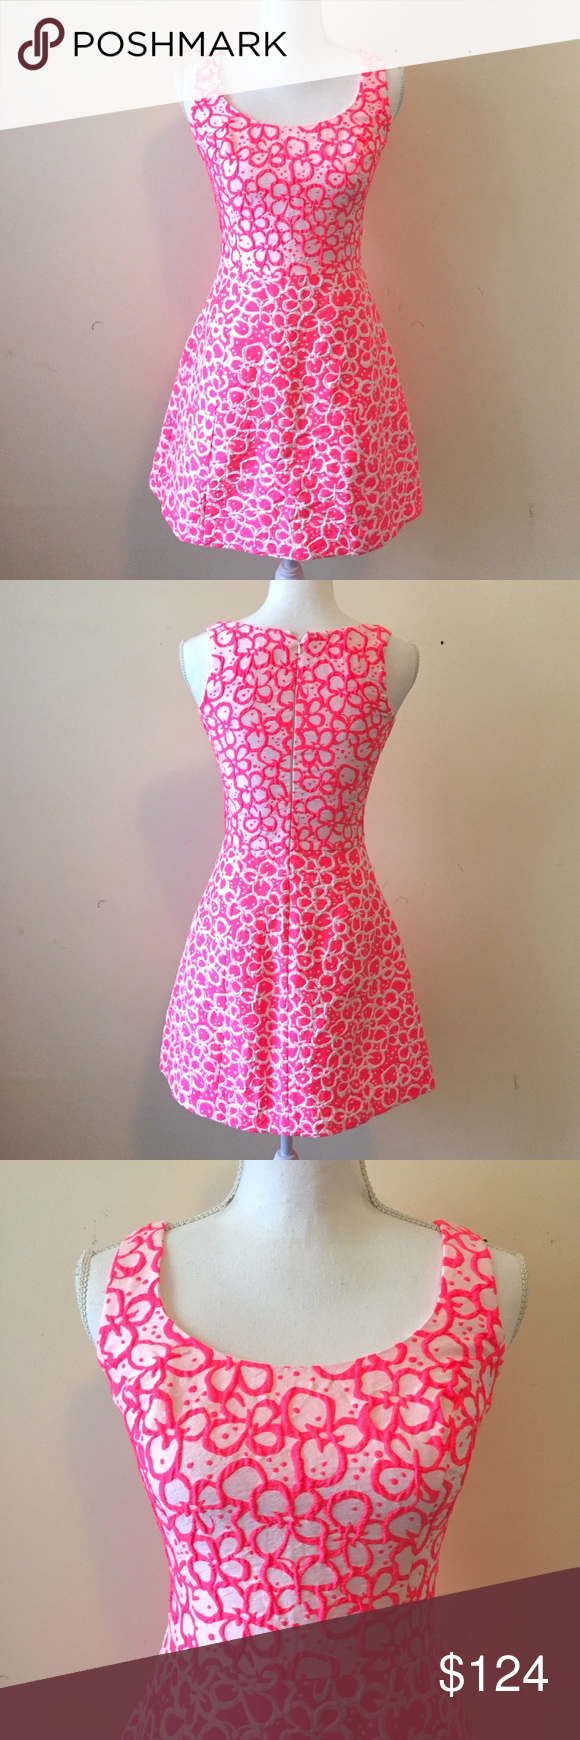 Lilly Pulitzer Joslin Dress in Fiesta Pink | Pinterest